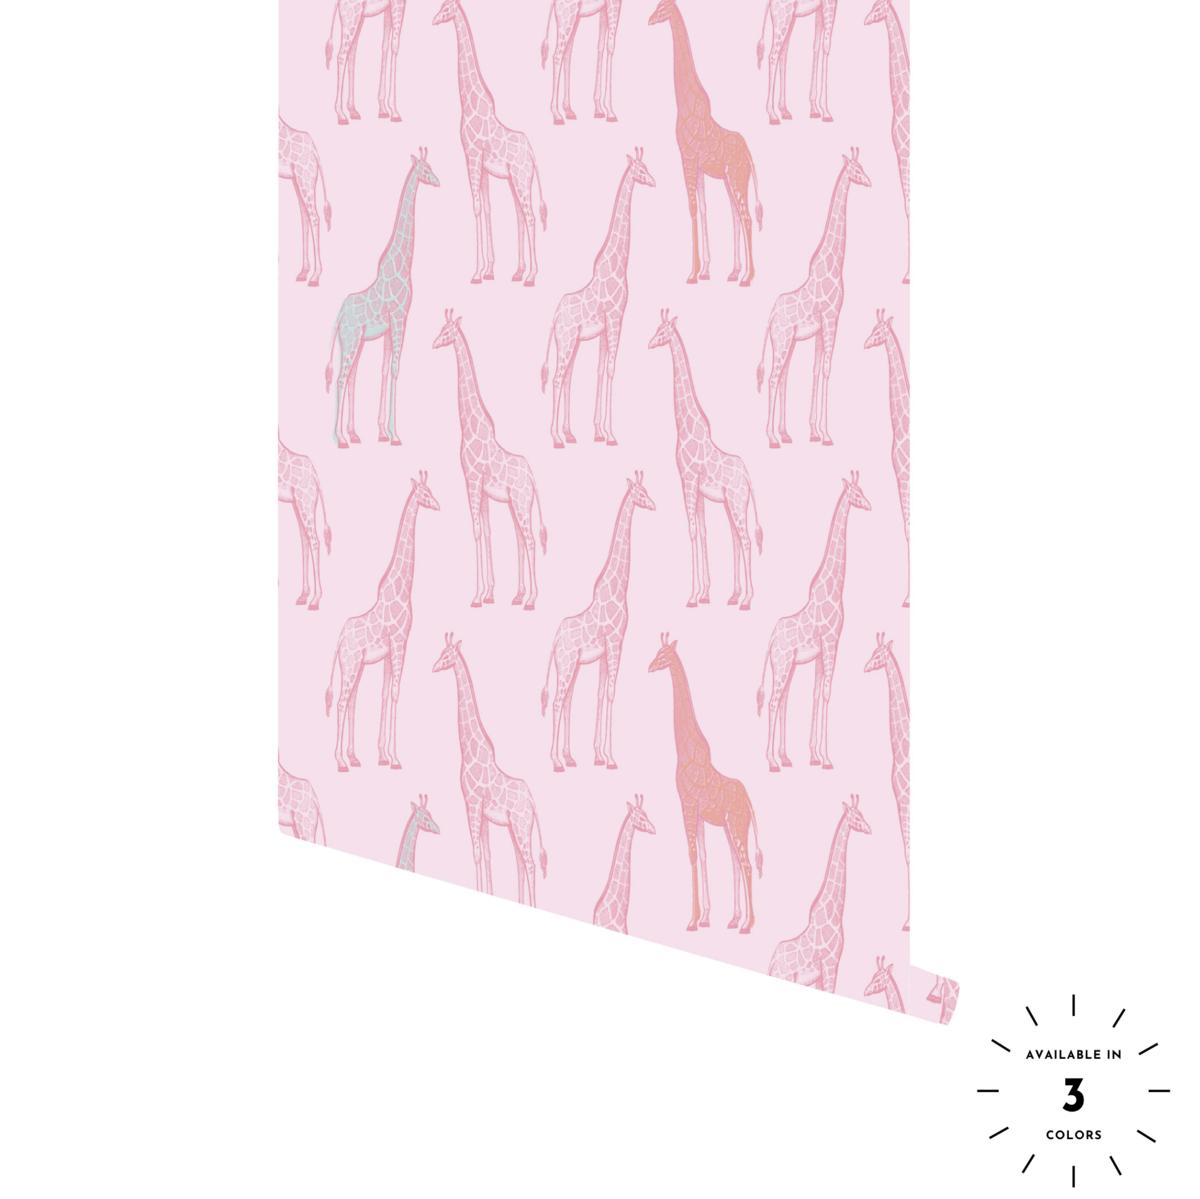 Sidney Giraffe Pattern Wallpaper Hand Sketch Peel And Stick Wallpaper